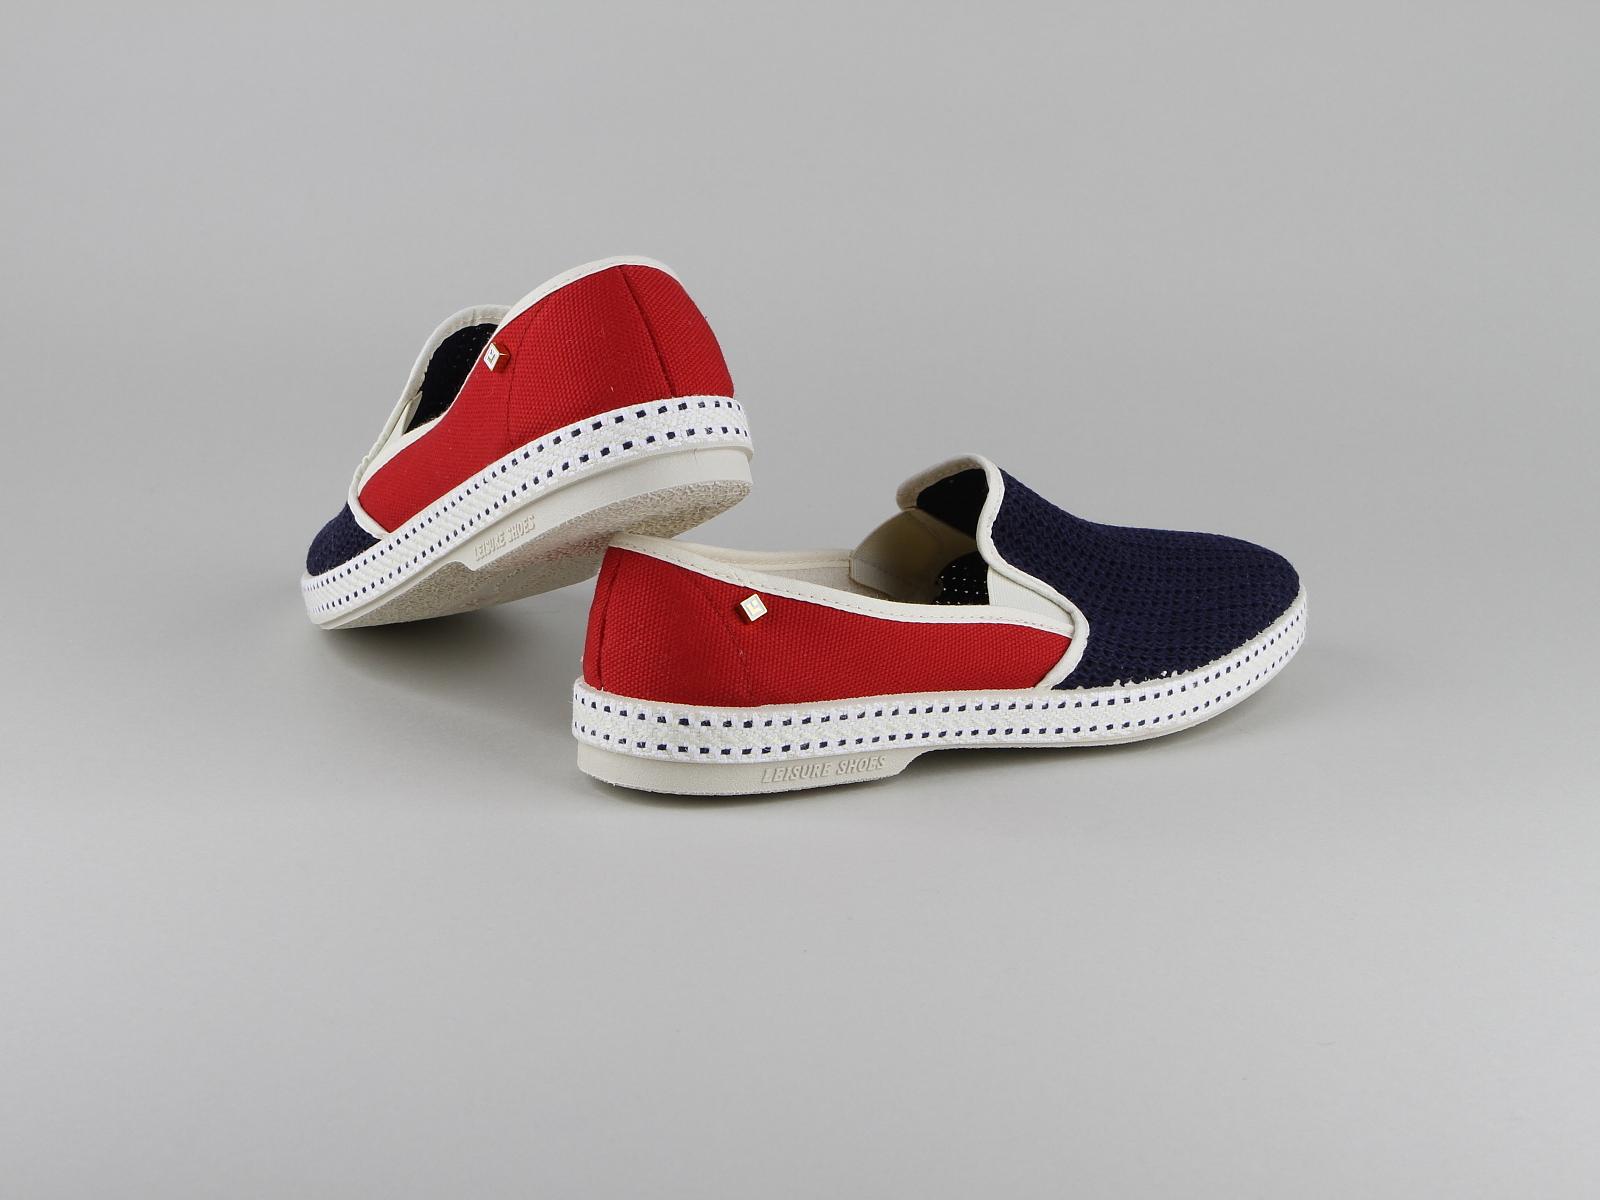 chaussure riviera